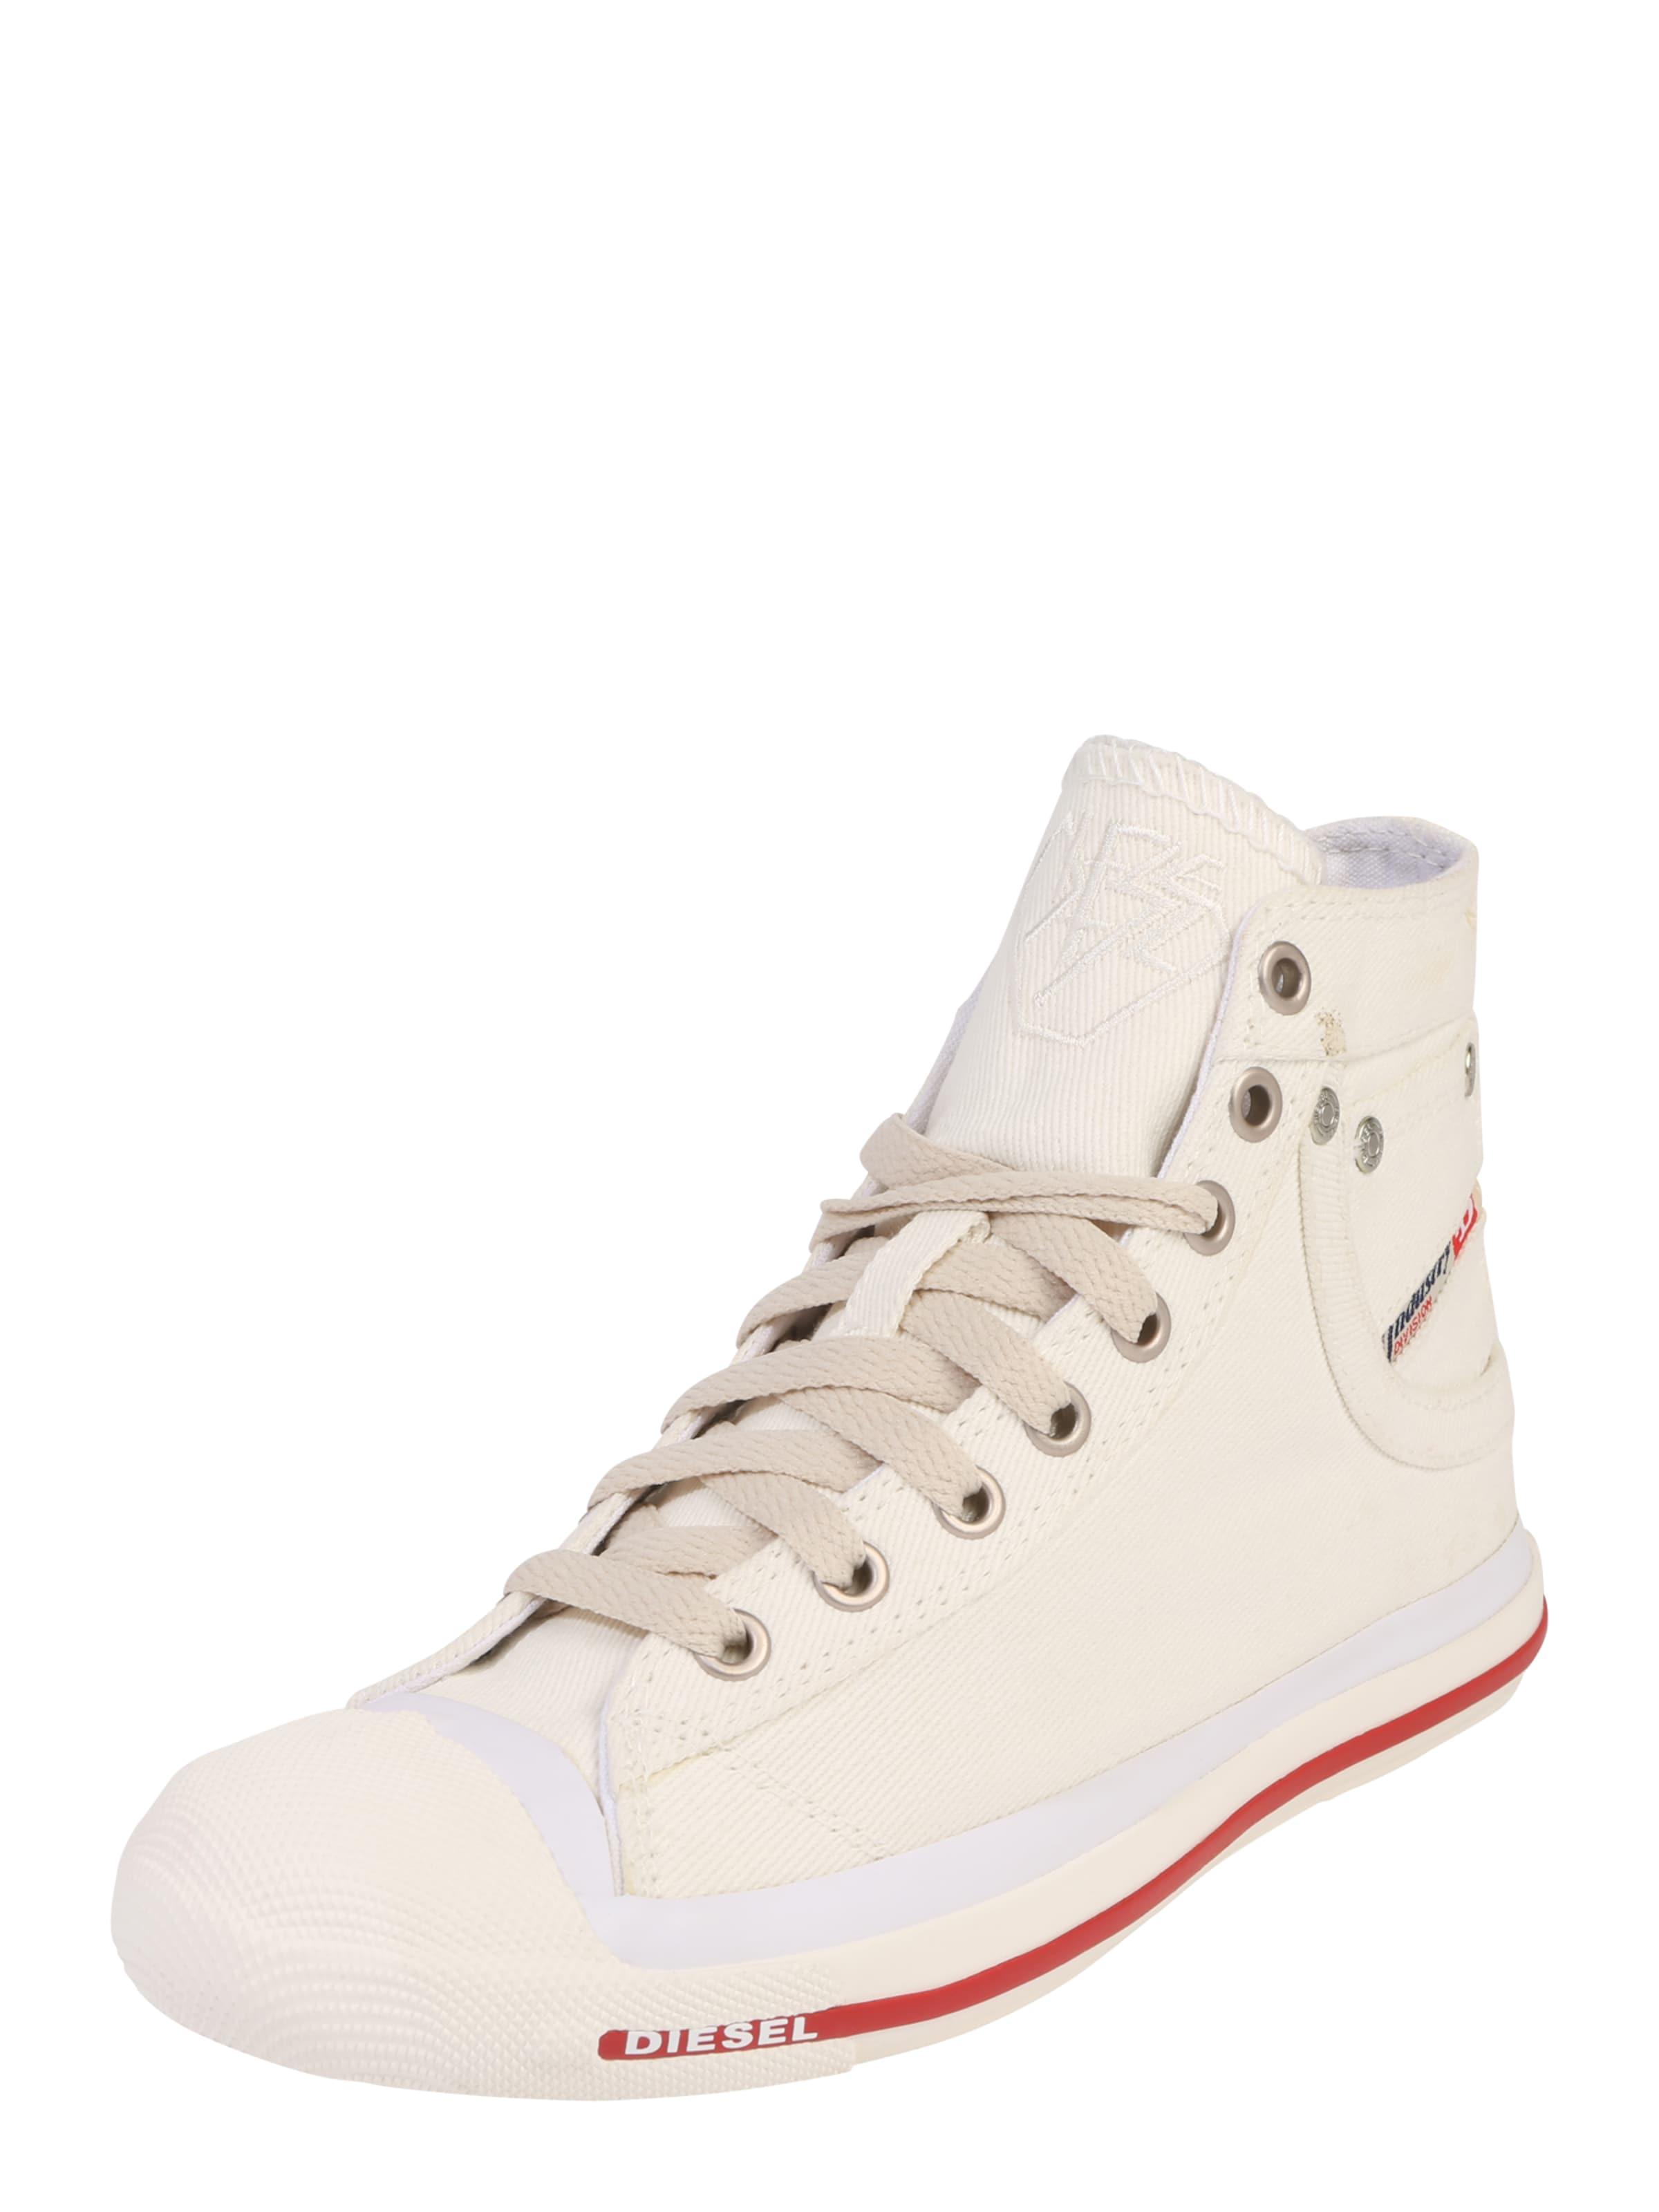 DIESEL Sneakers MAGNETE EXPOSURE W Hohe Qualität